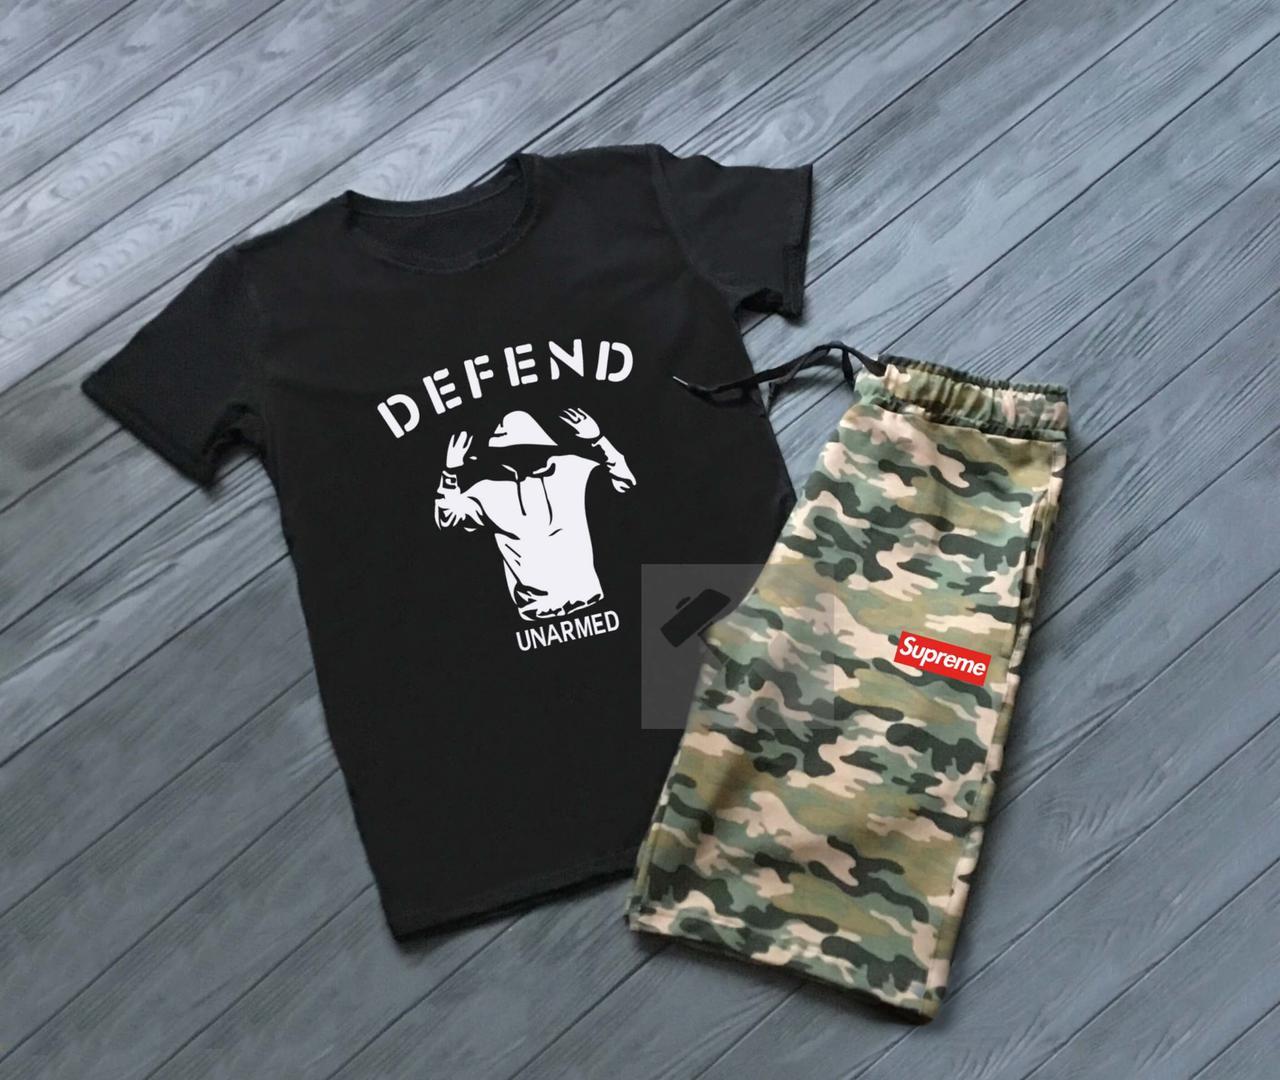 Летний спортивный костюм Supreme Defend Unarmed